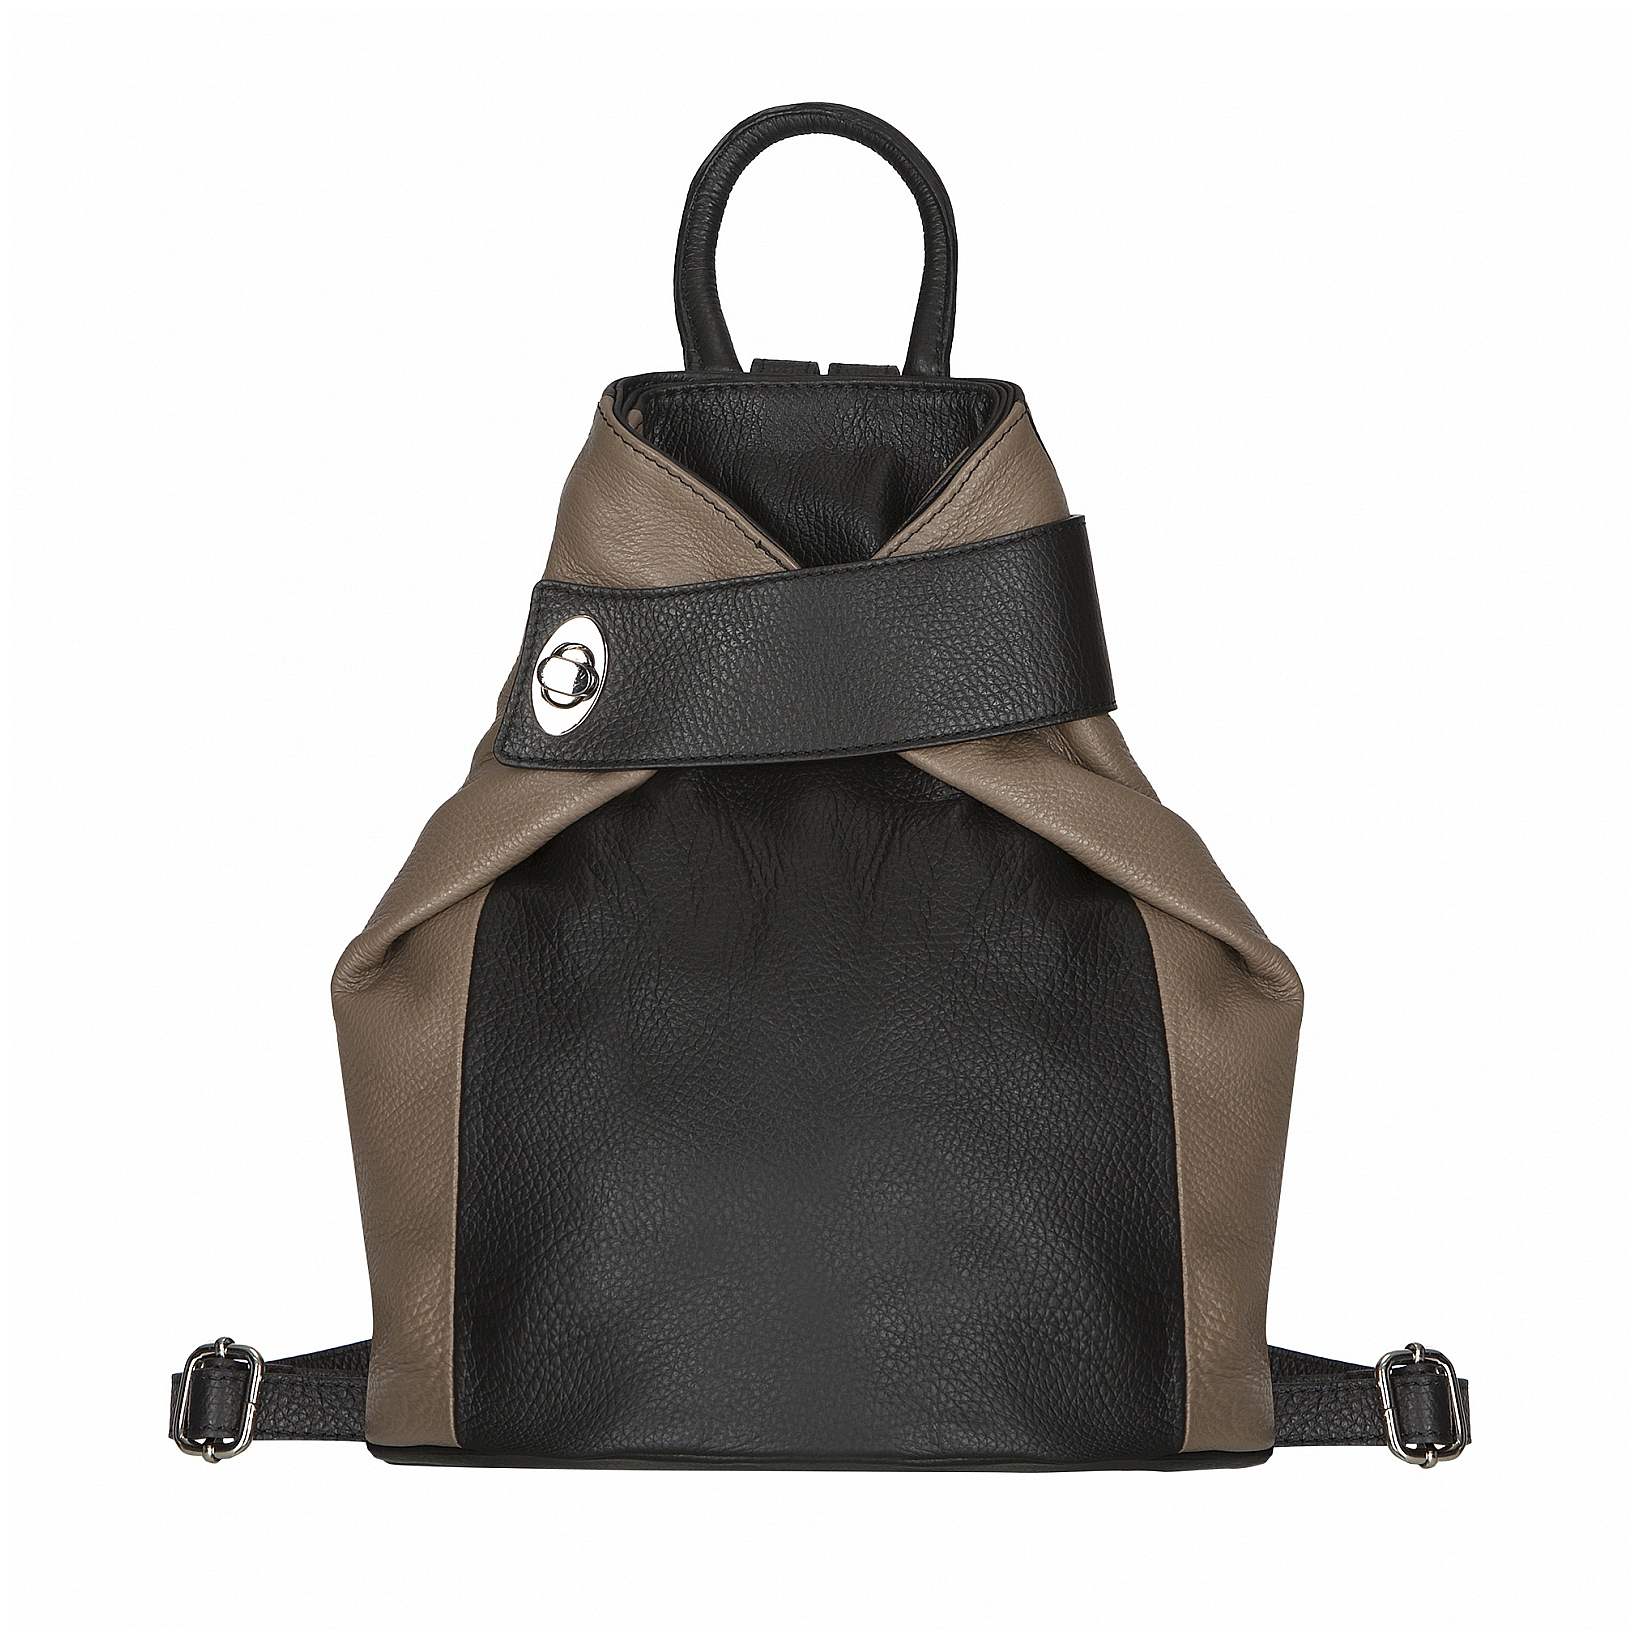 ESTELLE Dámský kožený batoh 0960 černo-béžový